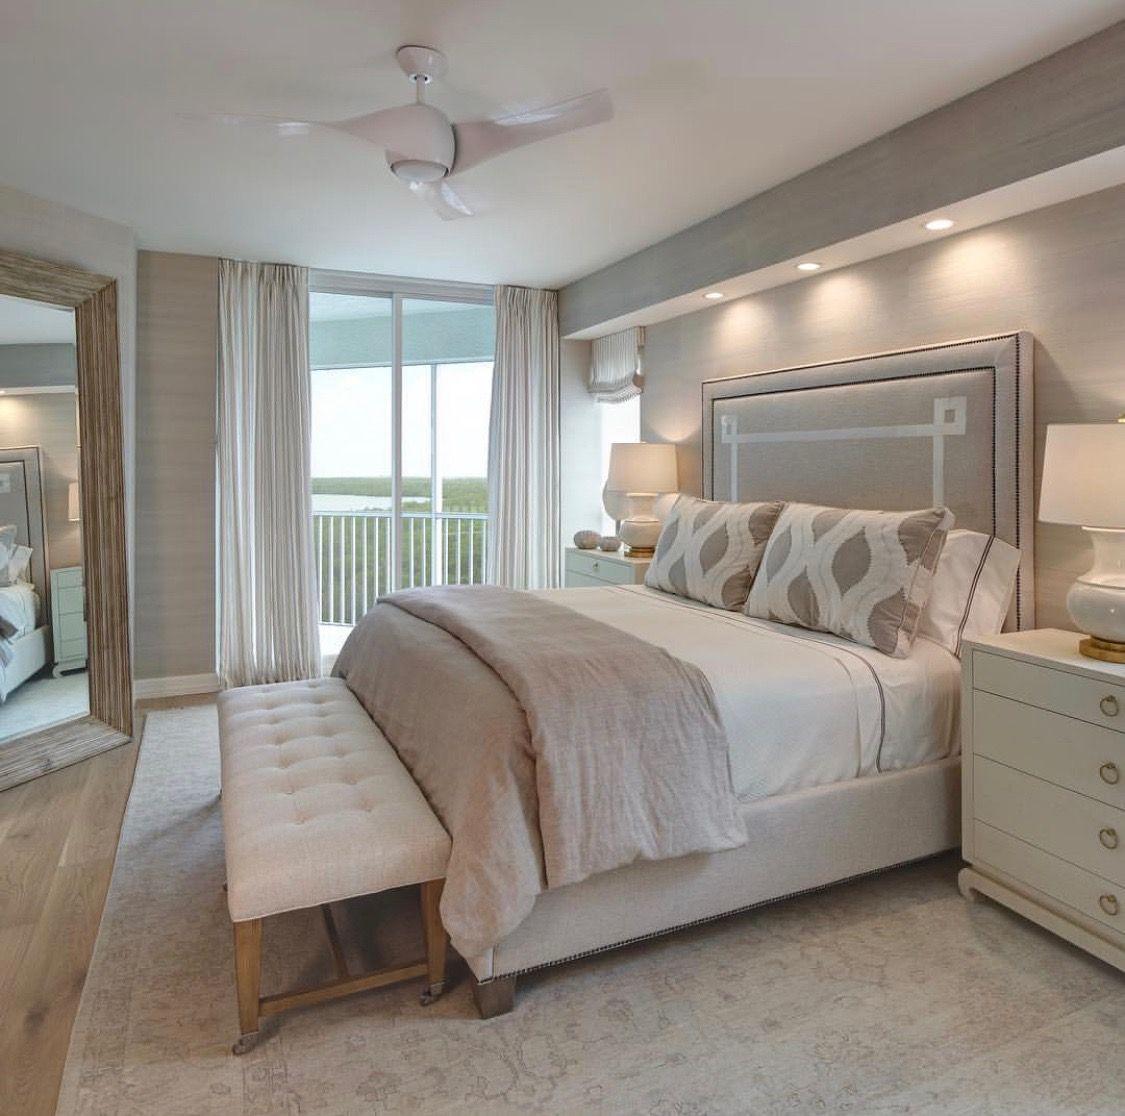 Ceiling fan in master bedroom bedroom decor in pinterest